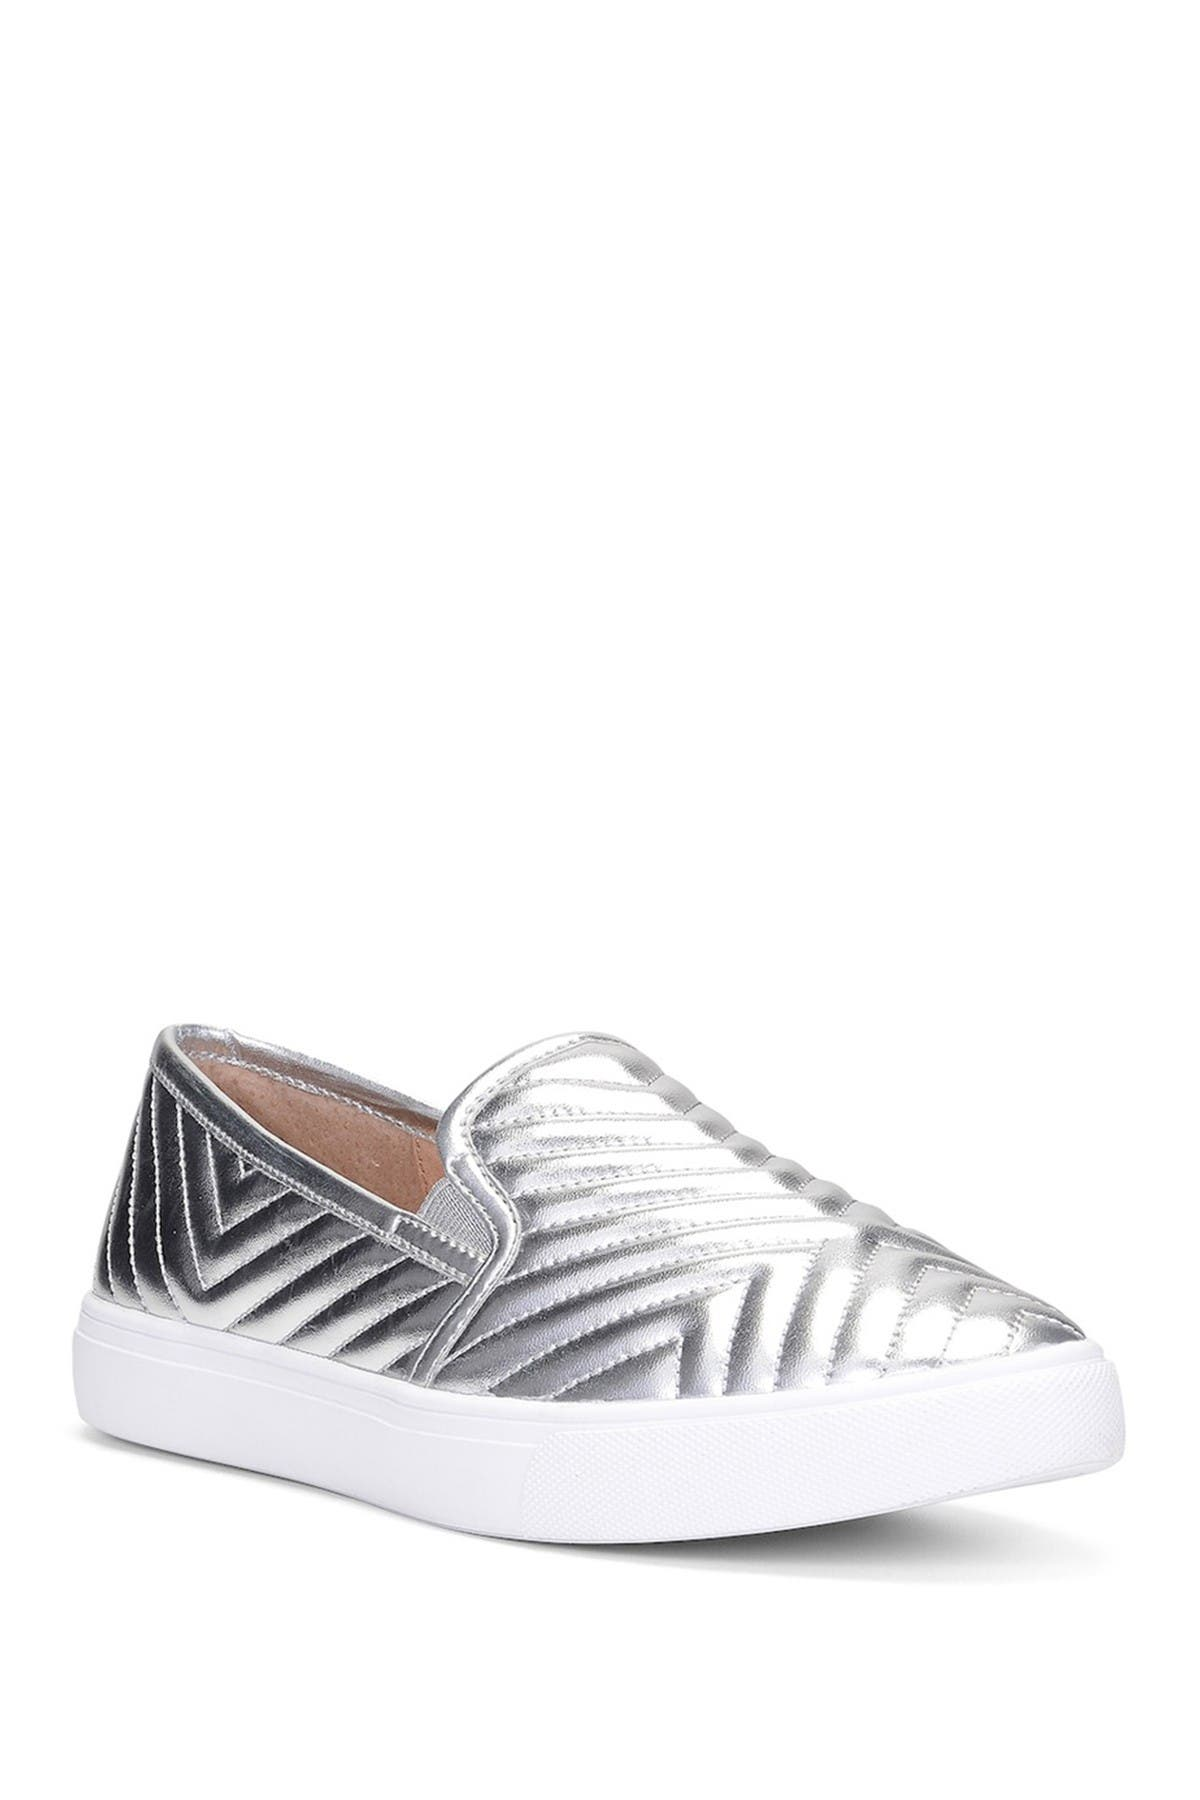 Image of Donald Pliner Pammy Metallic Quilted Slip-On Sneaker